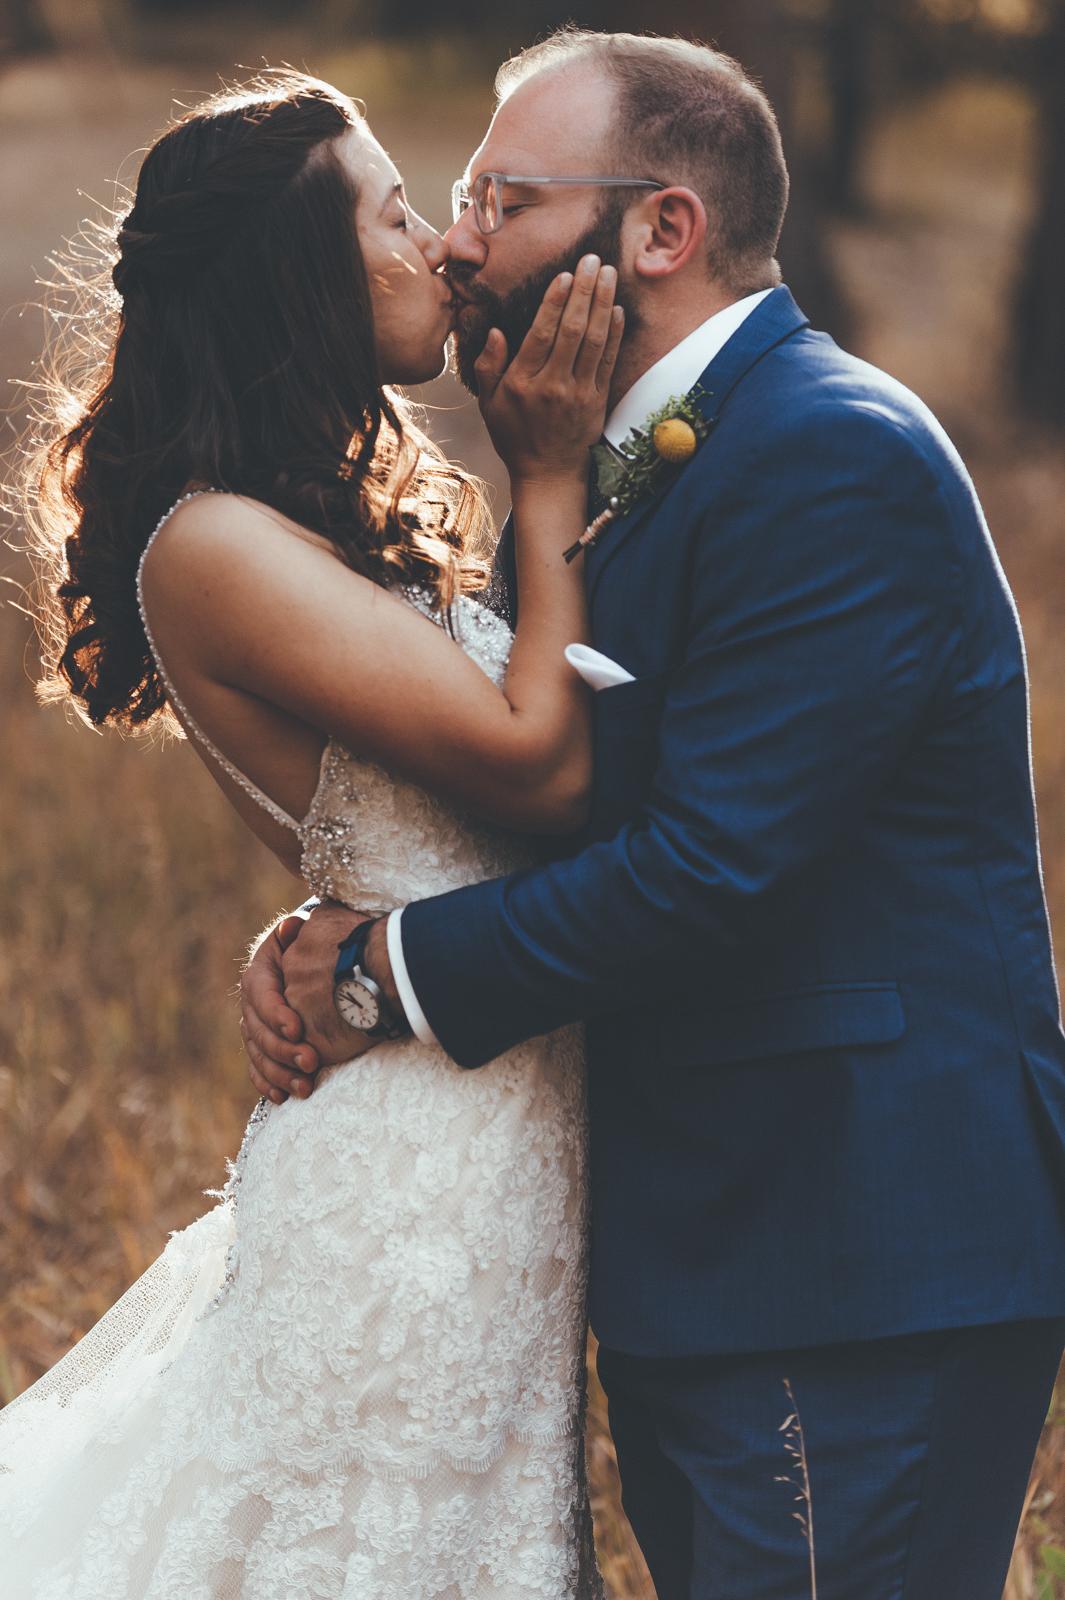 ChadFahnestockPhotography-estes-park-wedding-photography-041.jpg